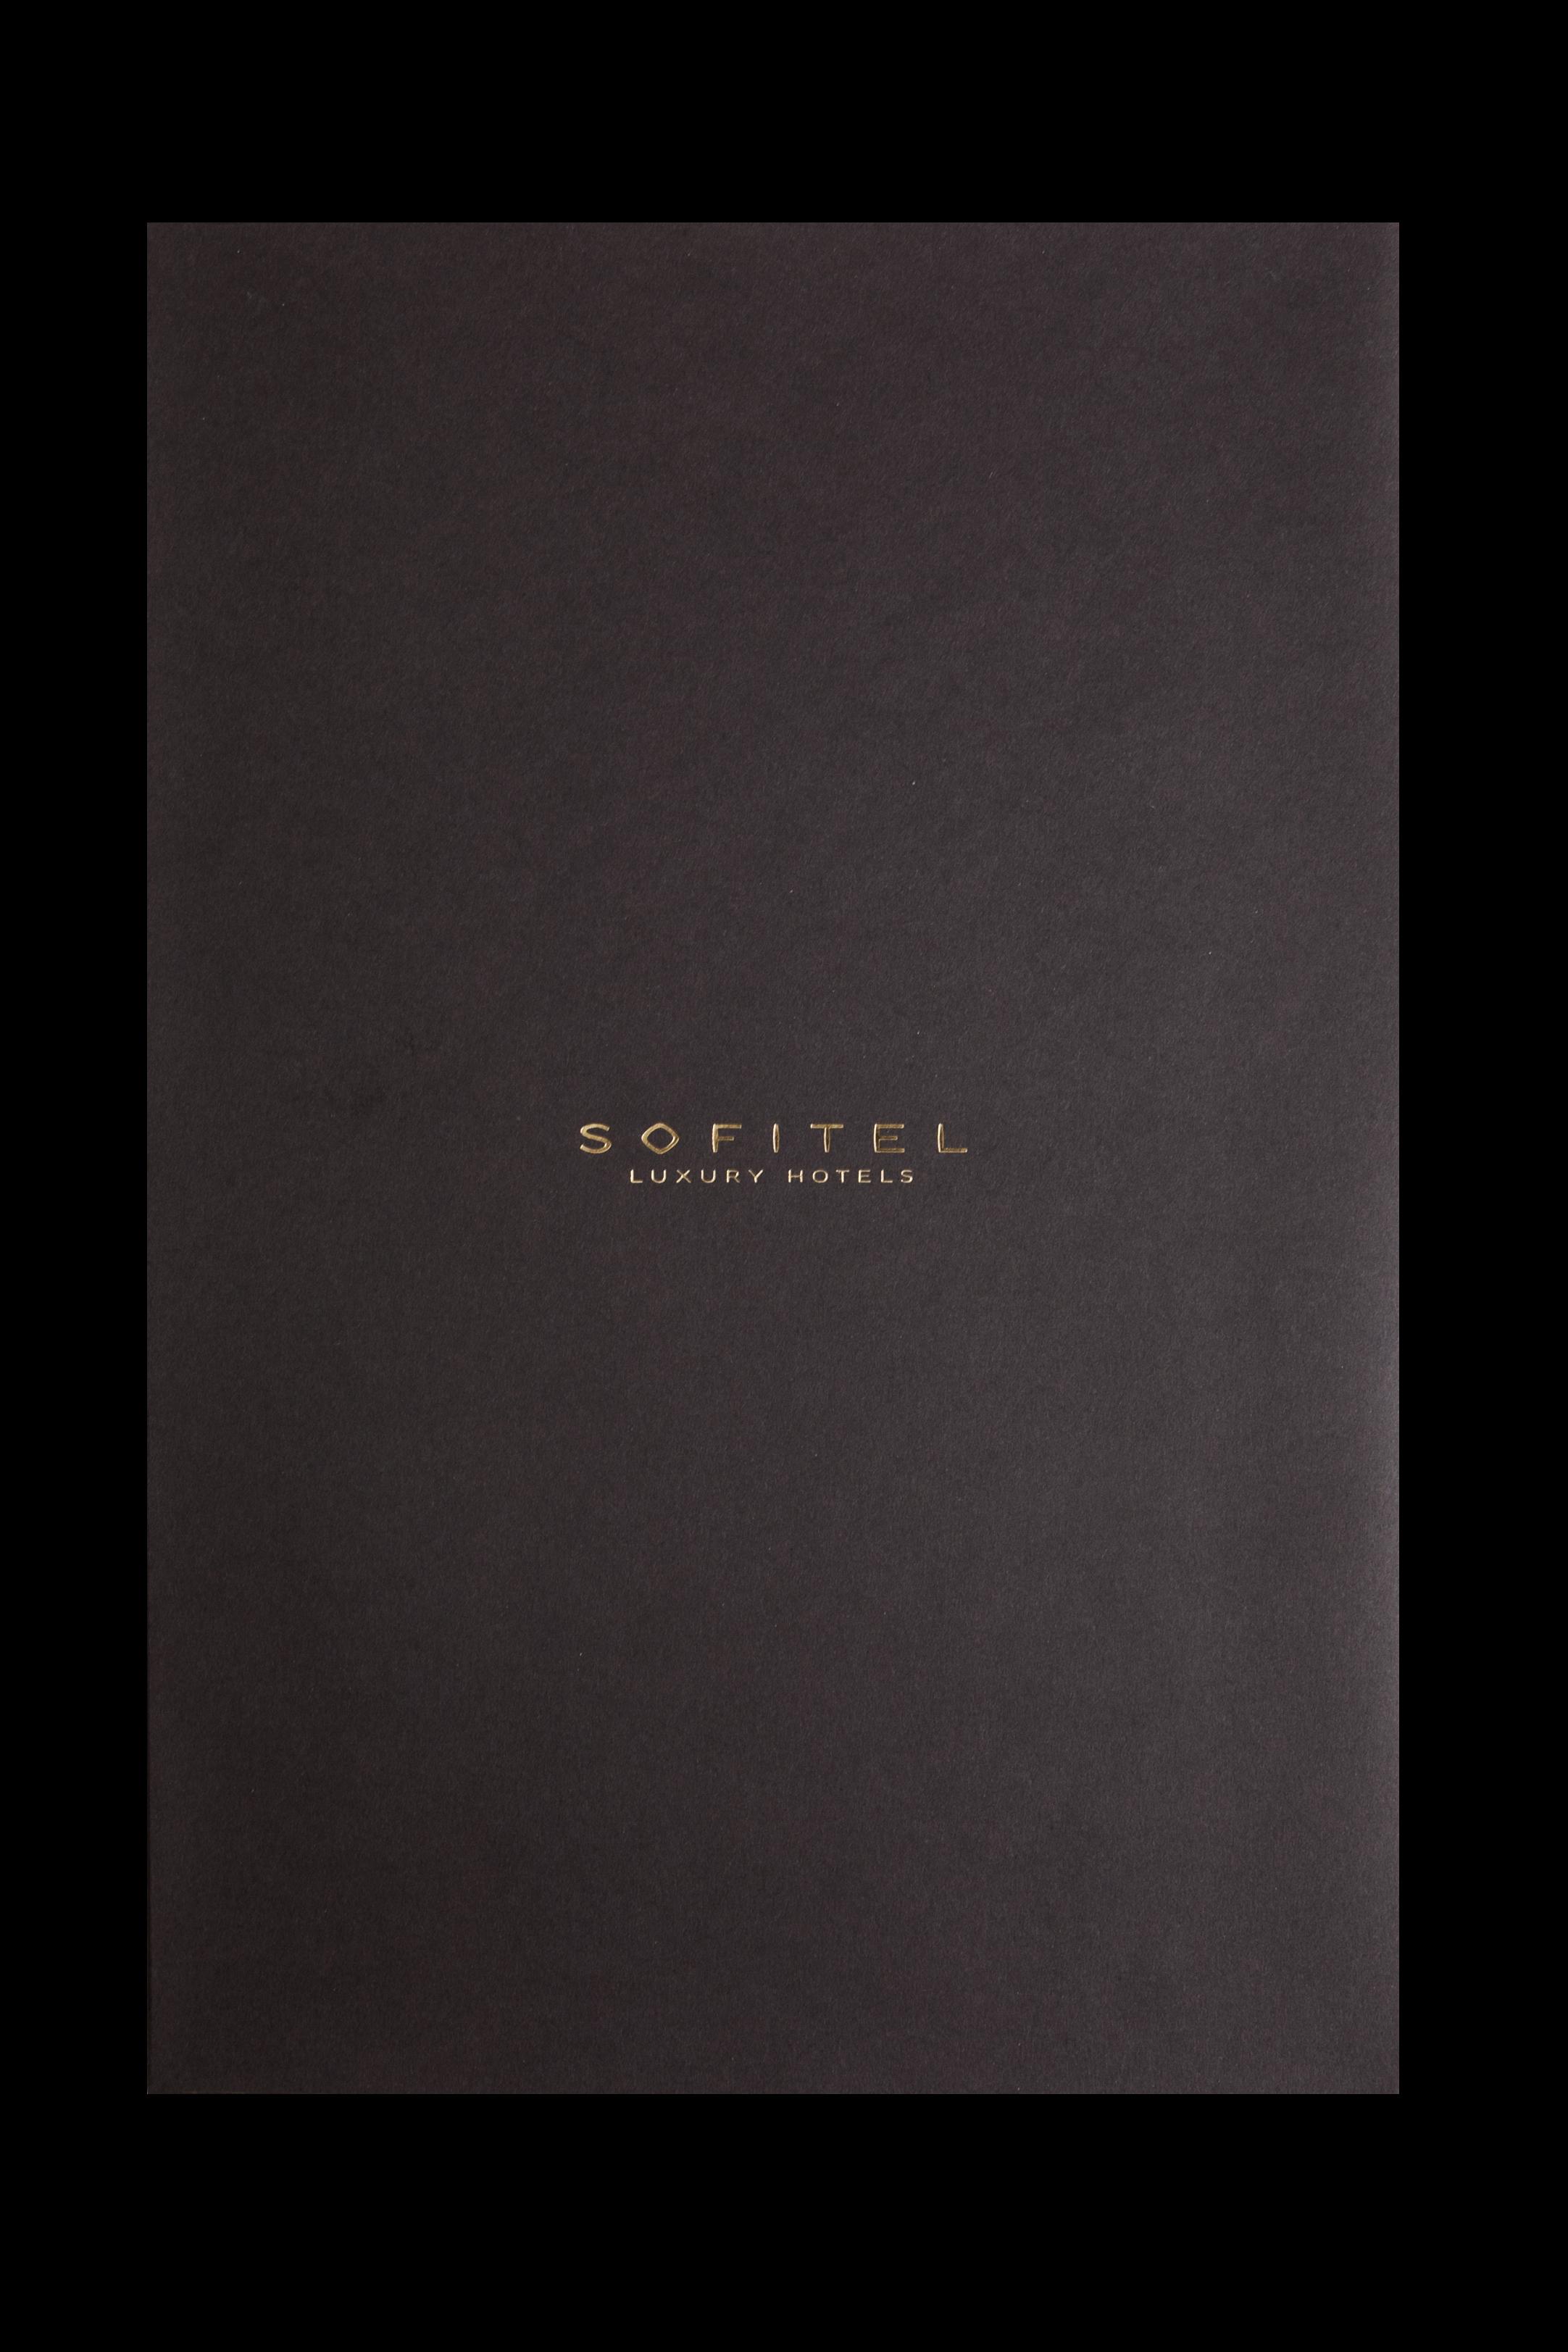 FOURREAU SOFITEL_9